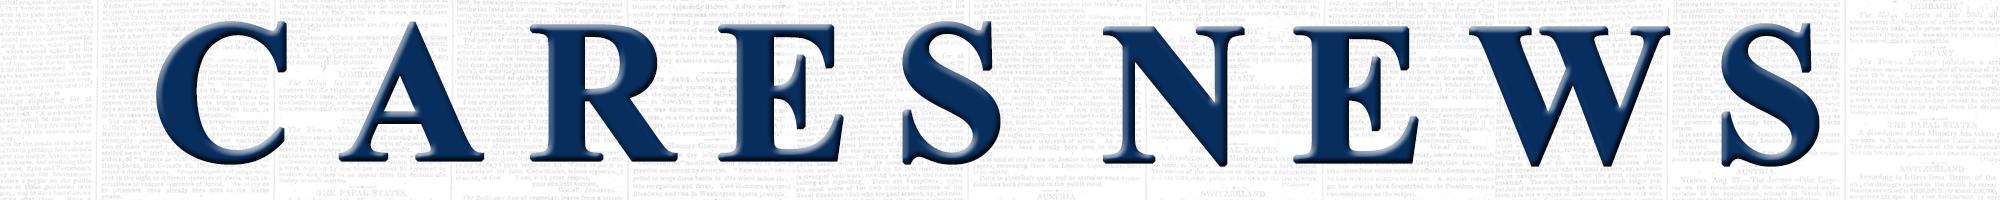 cares news head